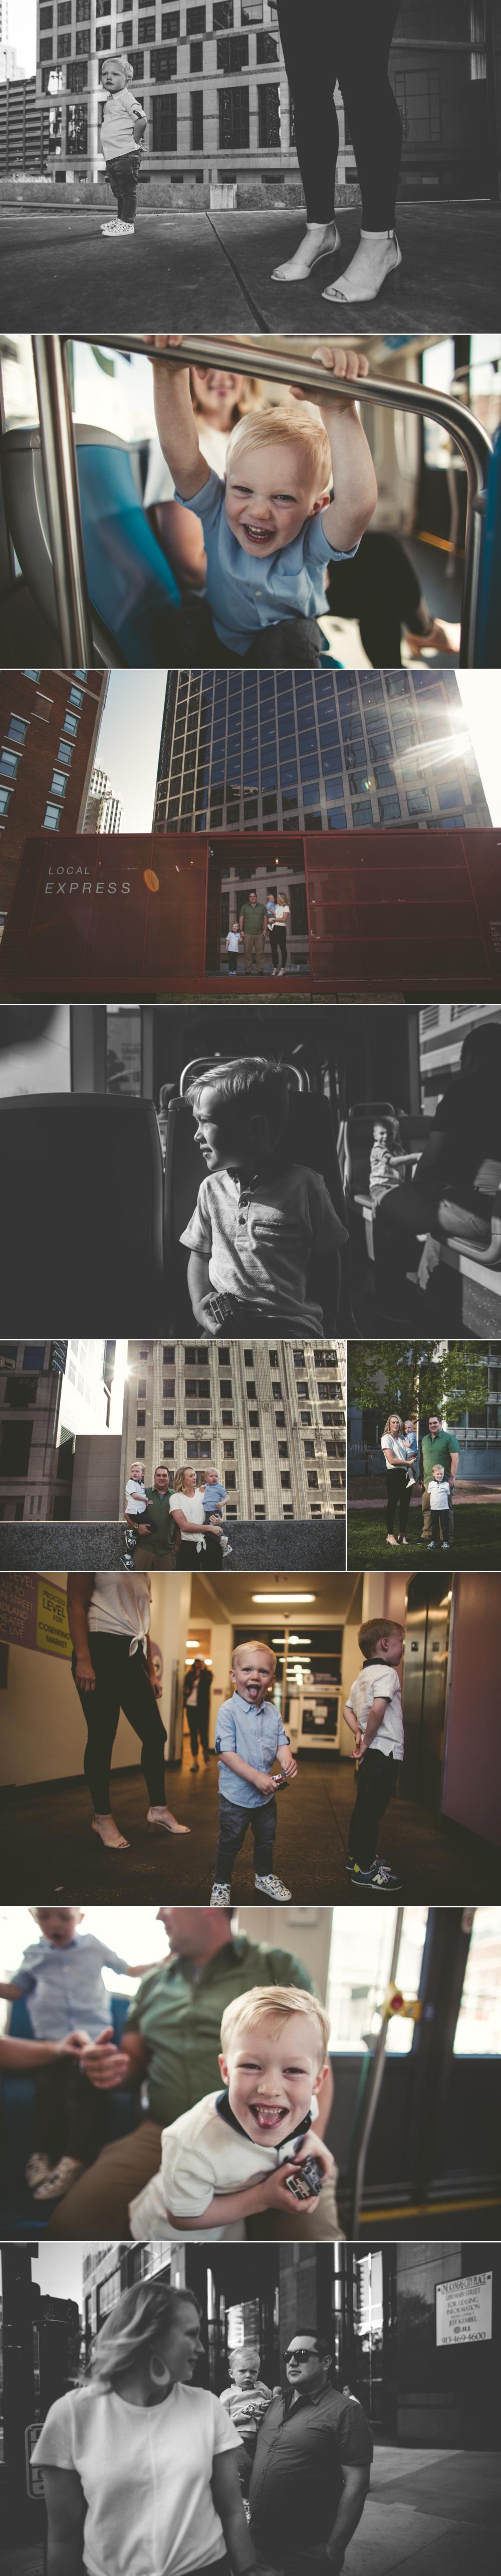 jason_domingues_photography_best_kansas_city_photographer_downtown_family_lifestyle_session_kc